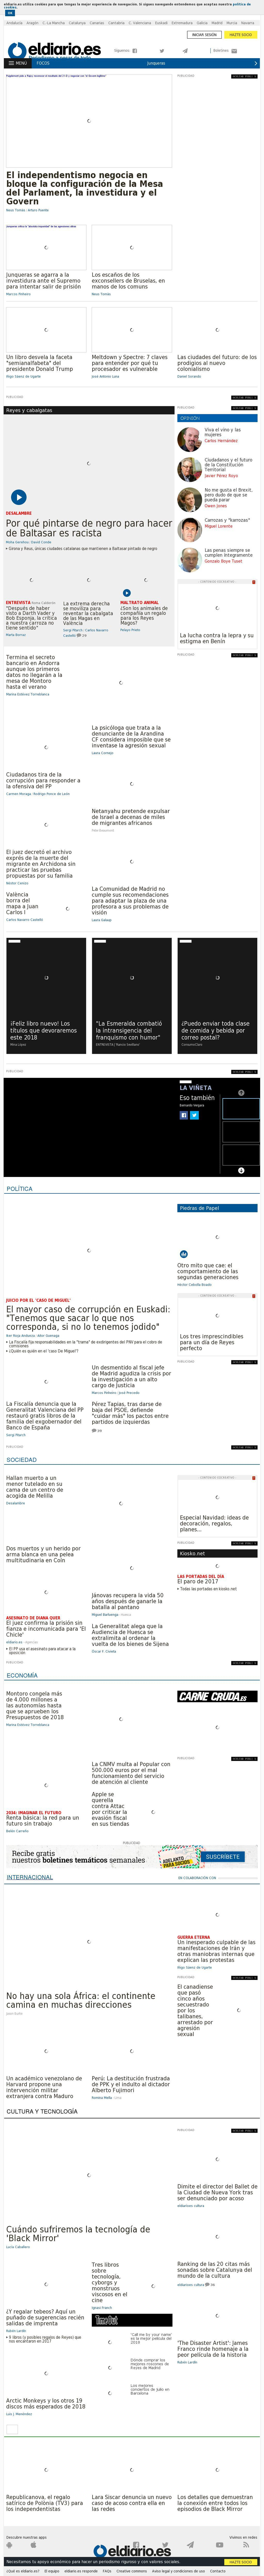 El Diario at Friday Jan. 5, 2018, 6:02 a.m. UTC